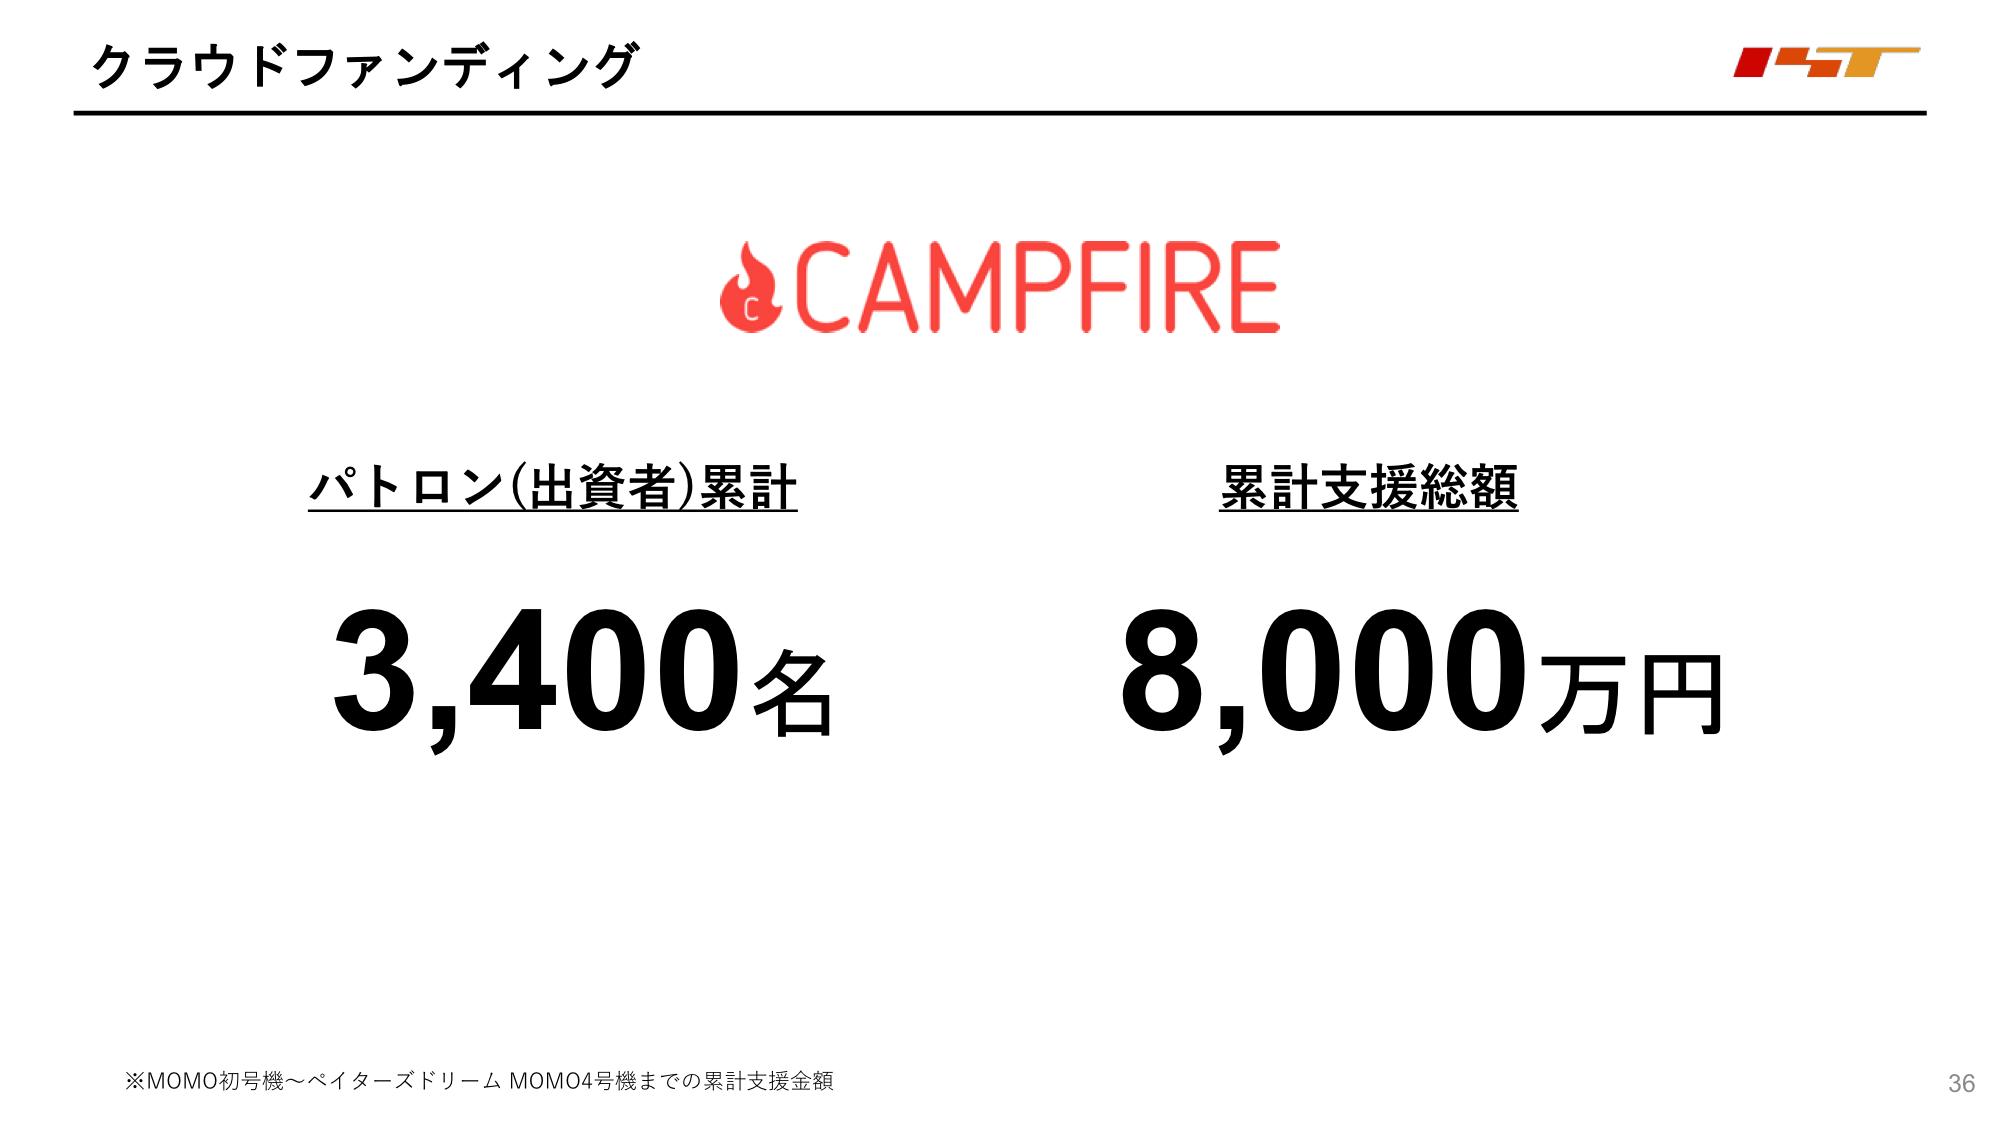 f:id:Imamura:20191126135352p:plain